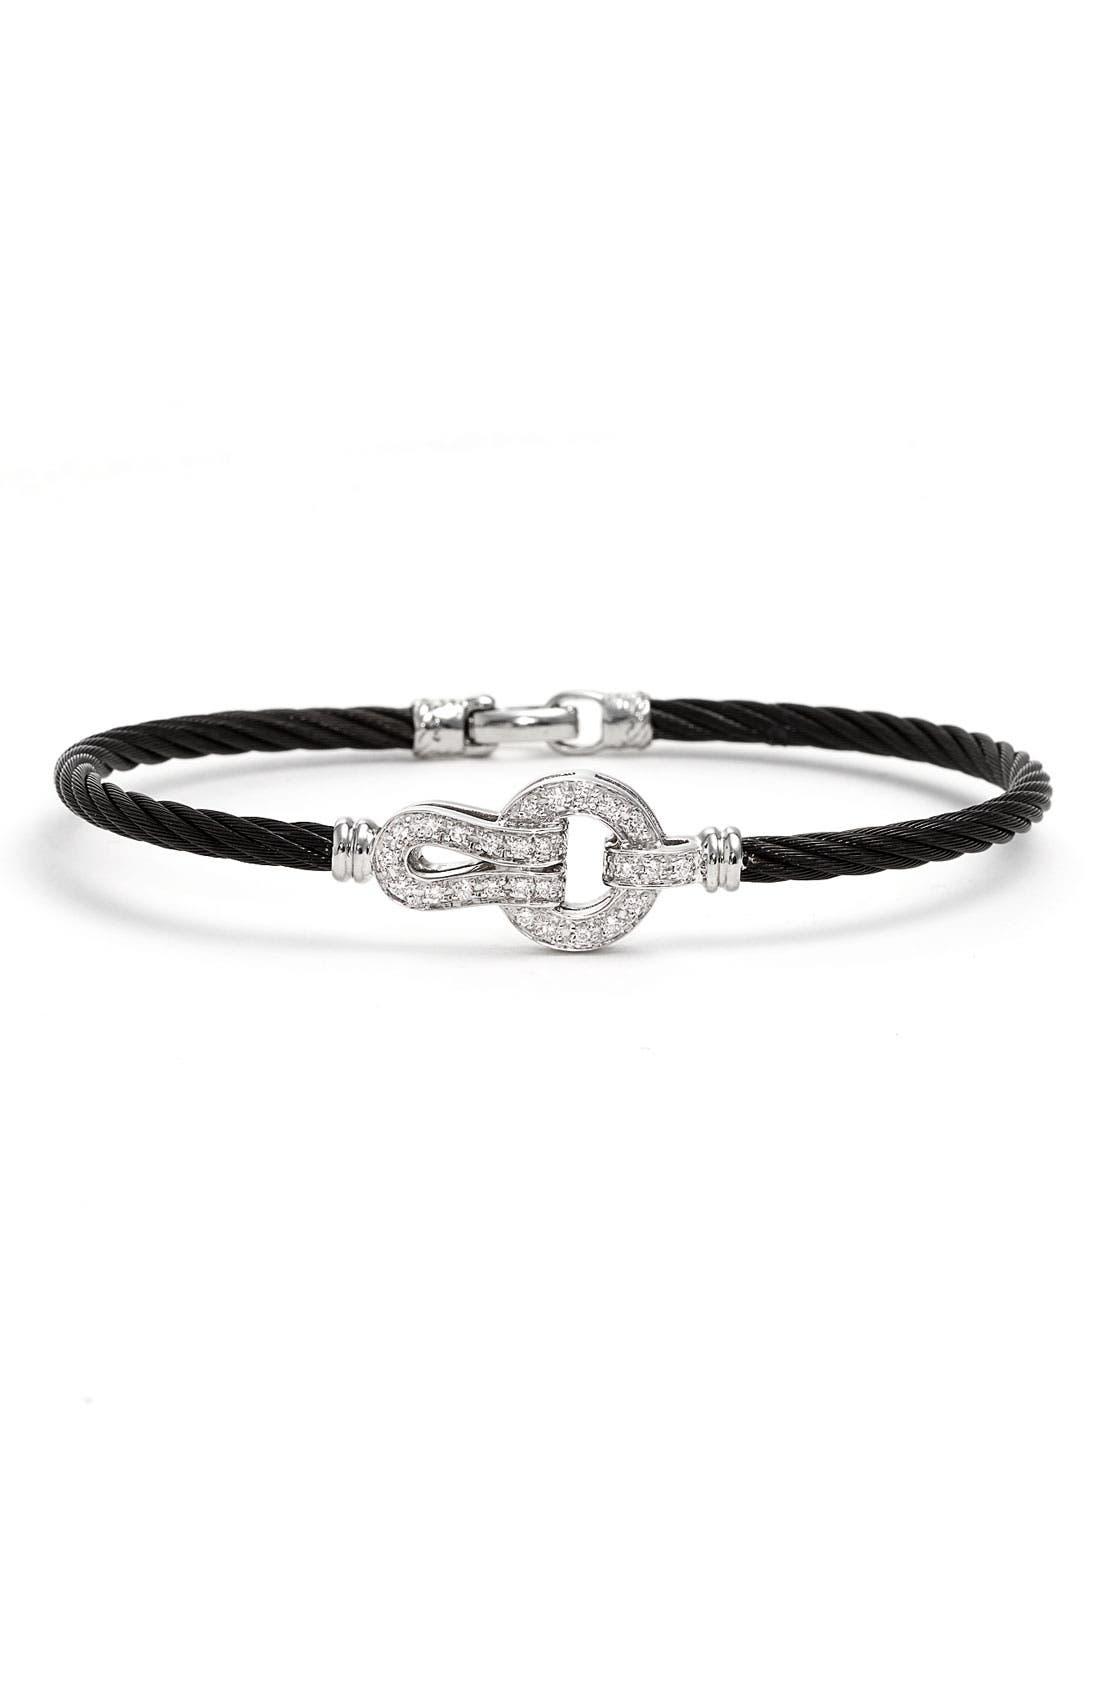 Main Image - ALOR® Circle Knot Diamond Bangle